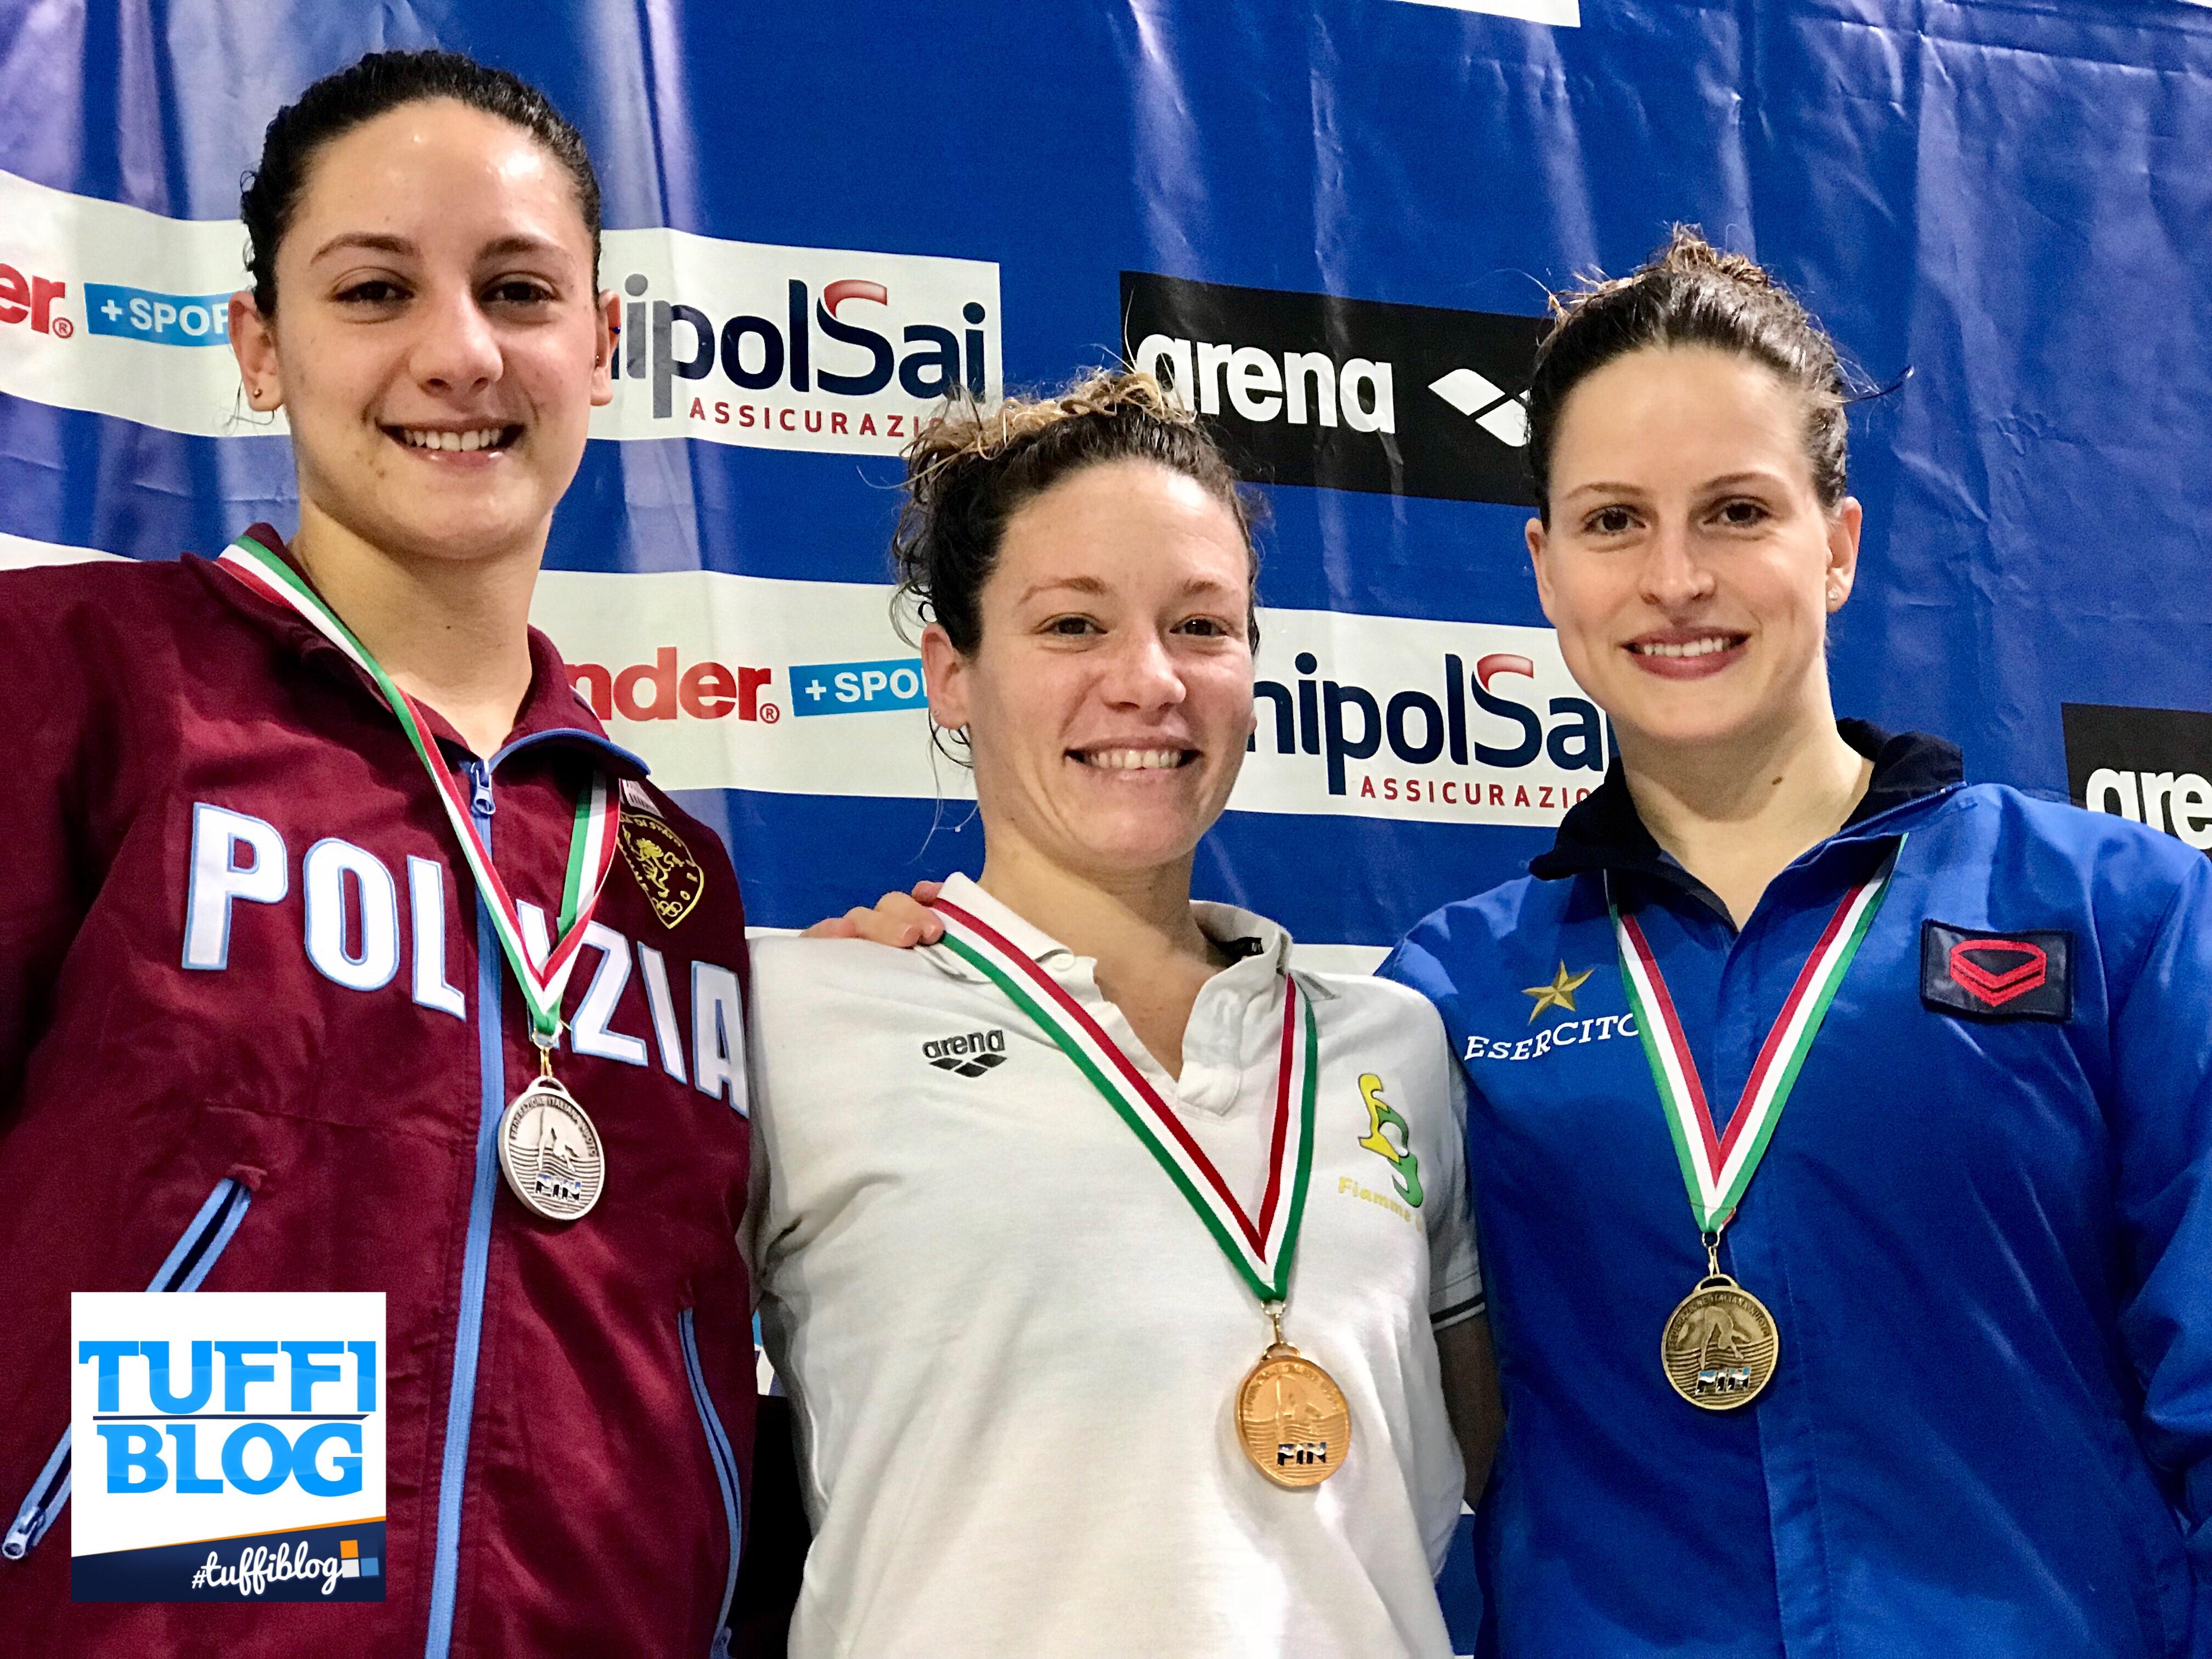 Campionati di Categoria Indoor: Trieste - Maria e Francesca, ritrovarsi in gara.